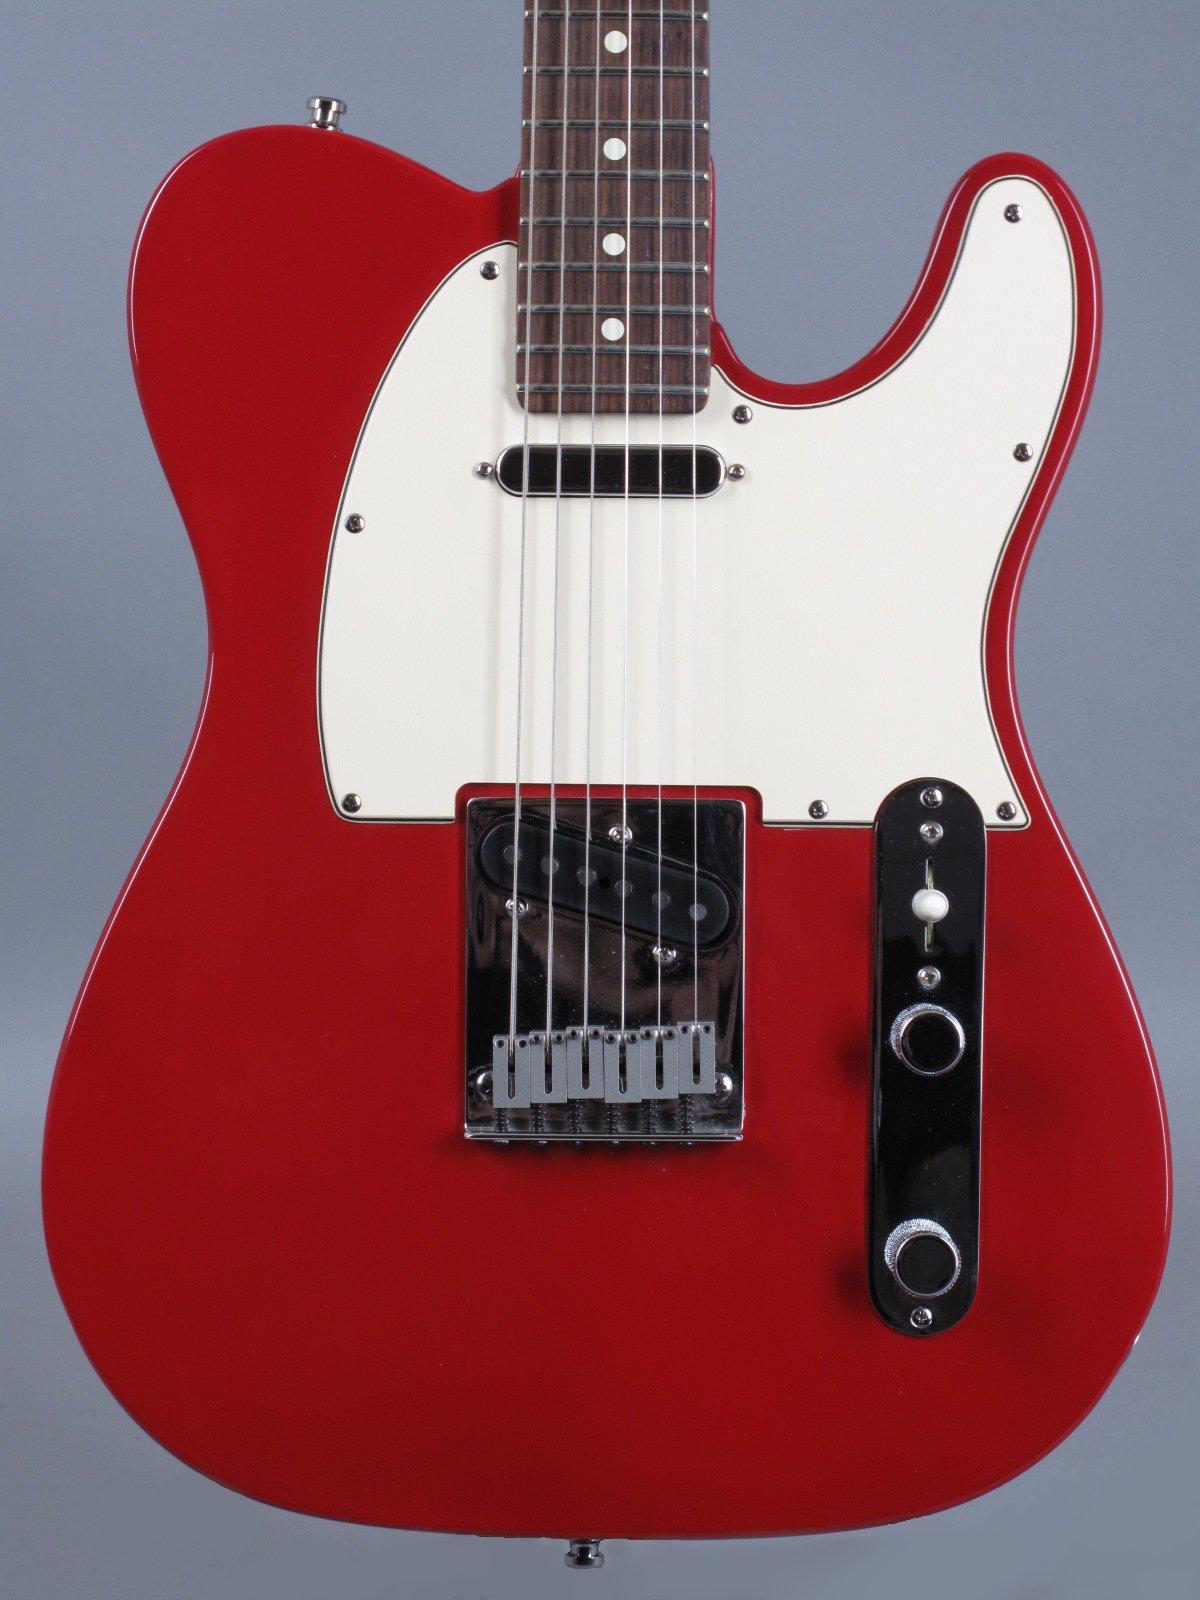 1995 Fender Standard Telecaster - Lipstick Red